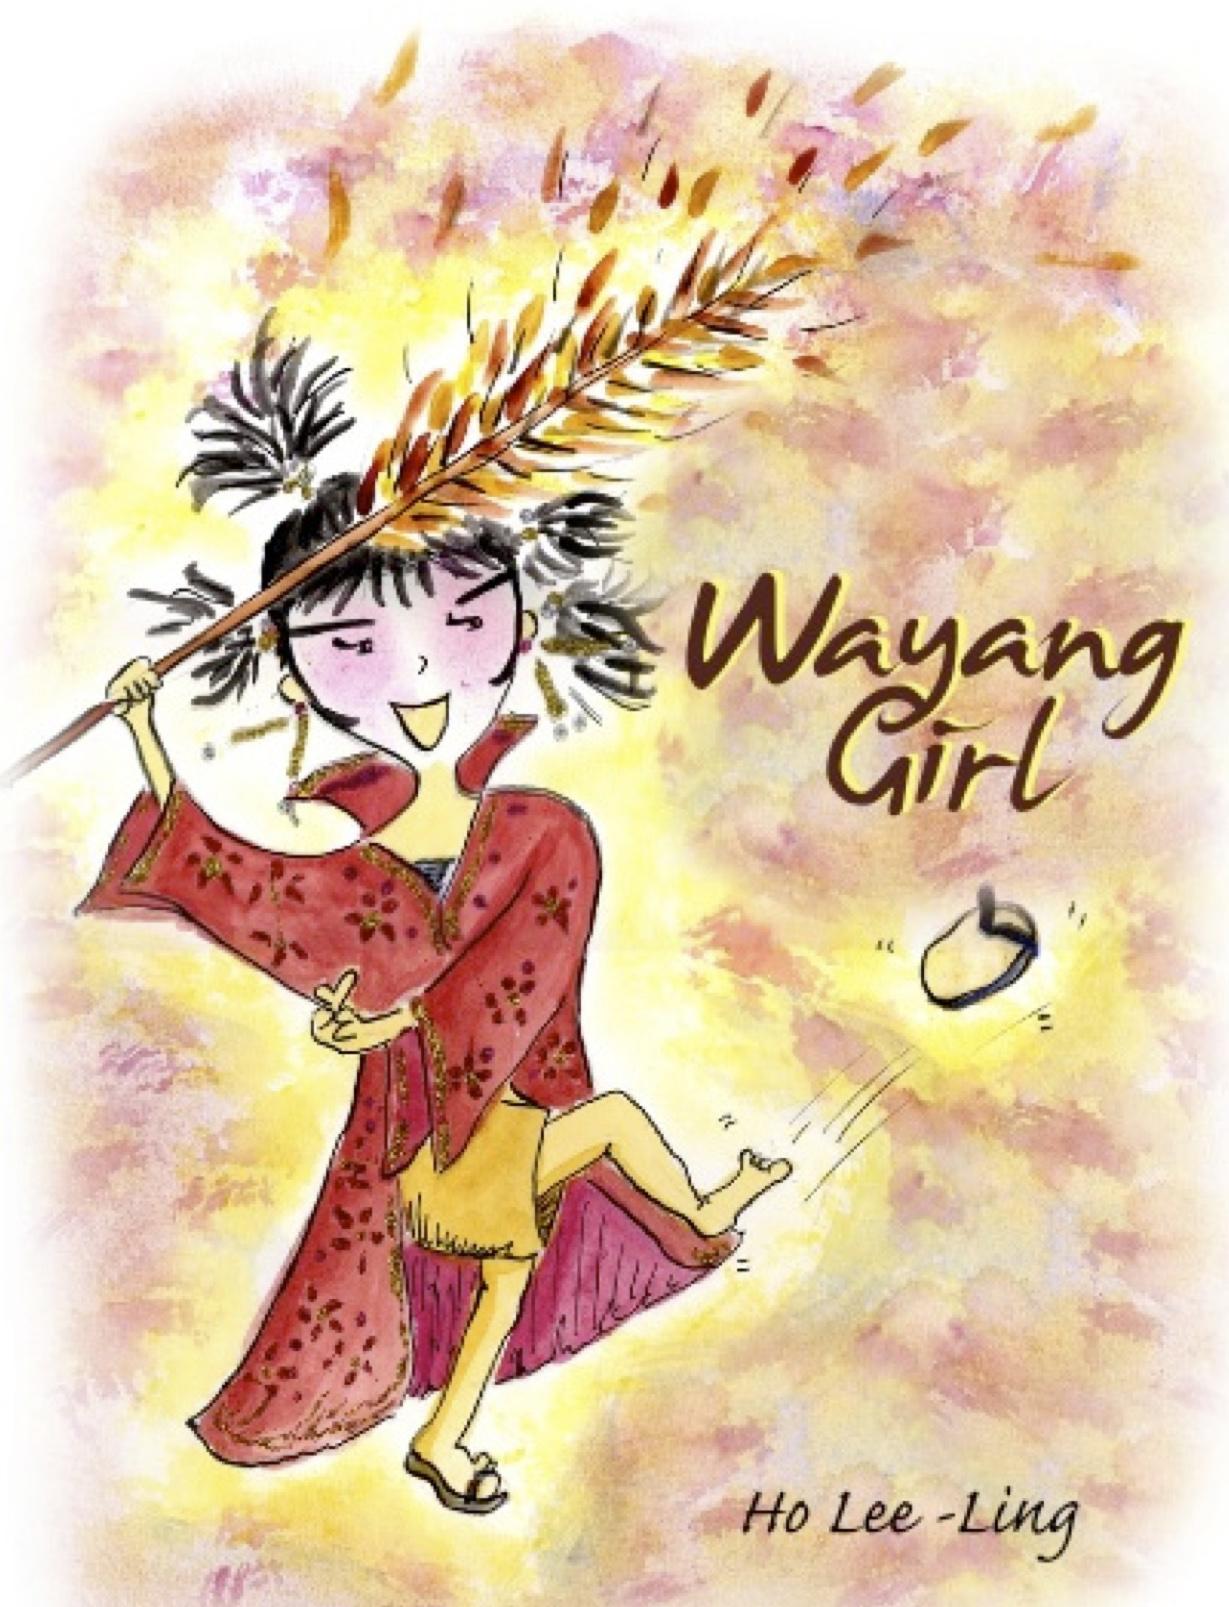 Wayang Girl